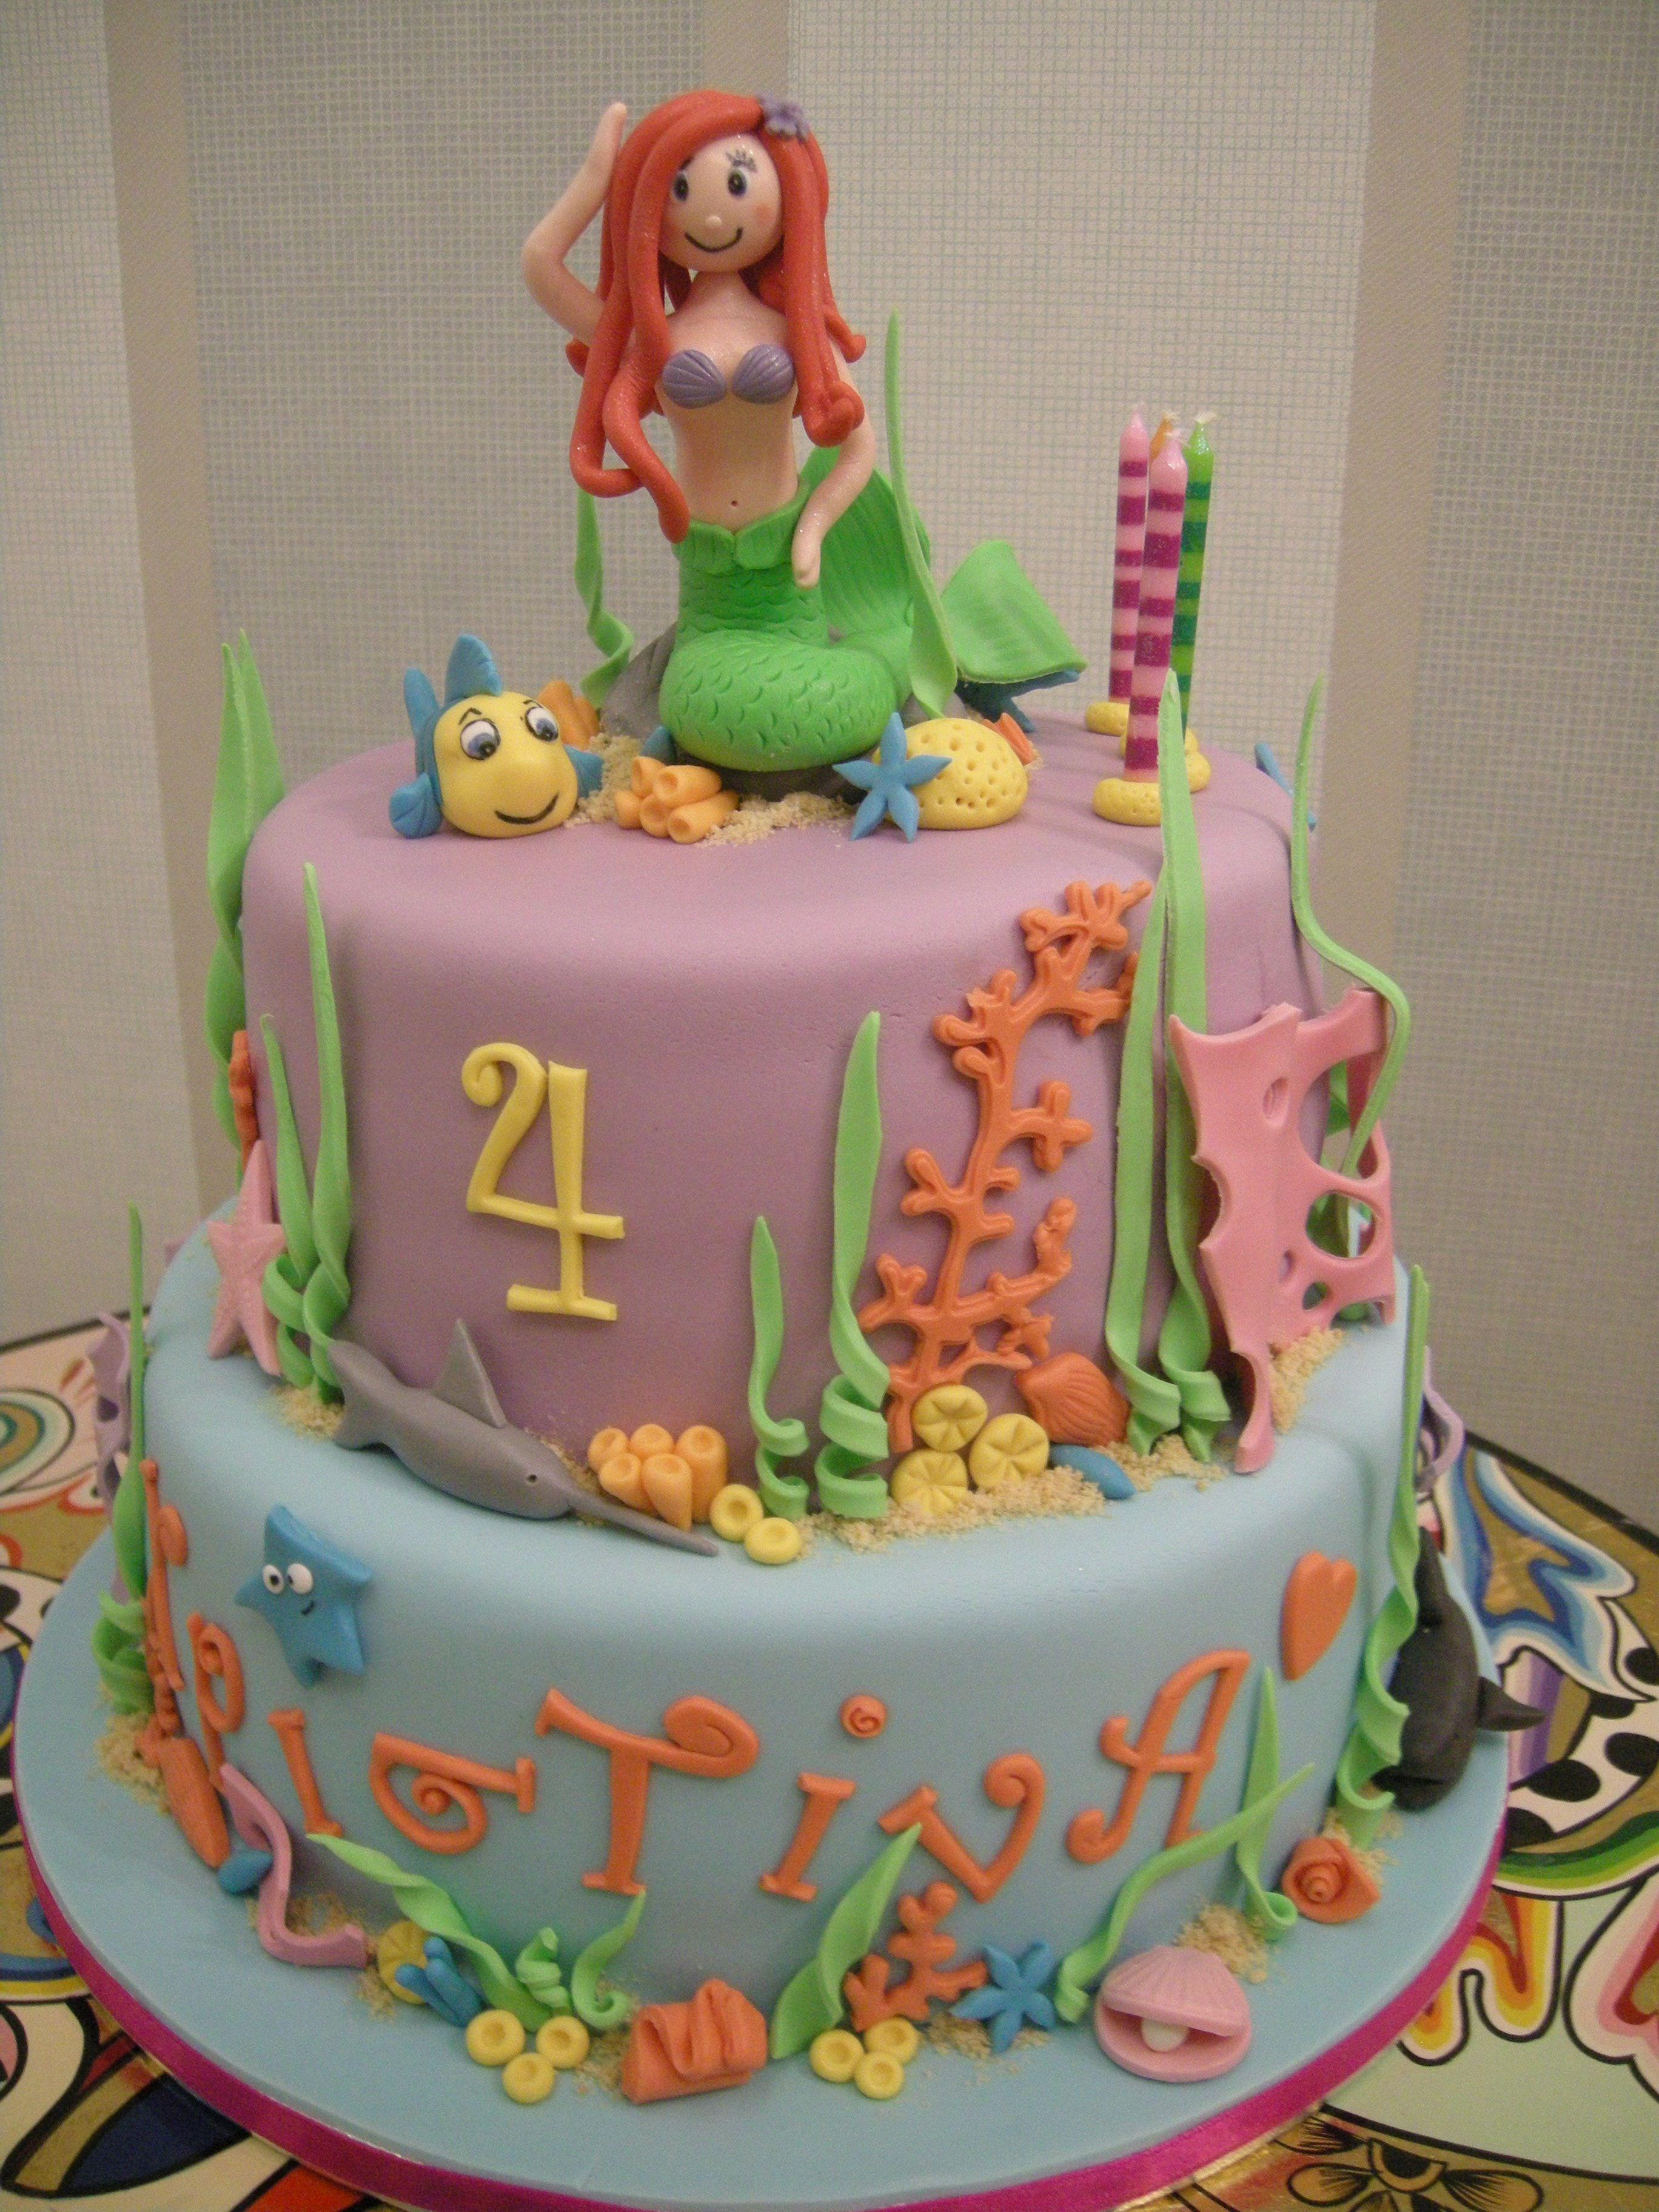 50 Disneys Ariel Cake Design (Cake Idea) - October 2019